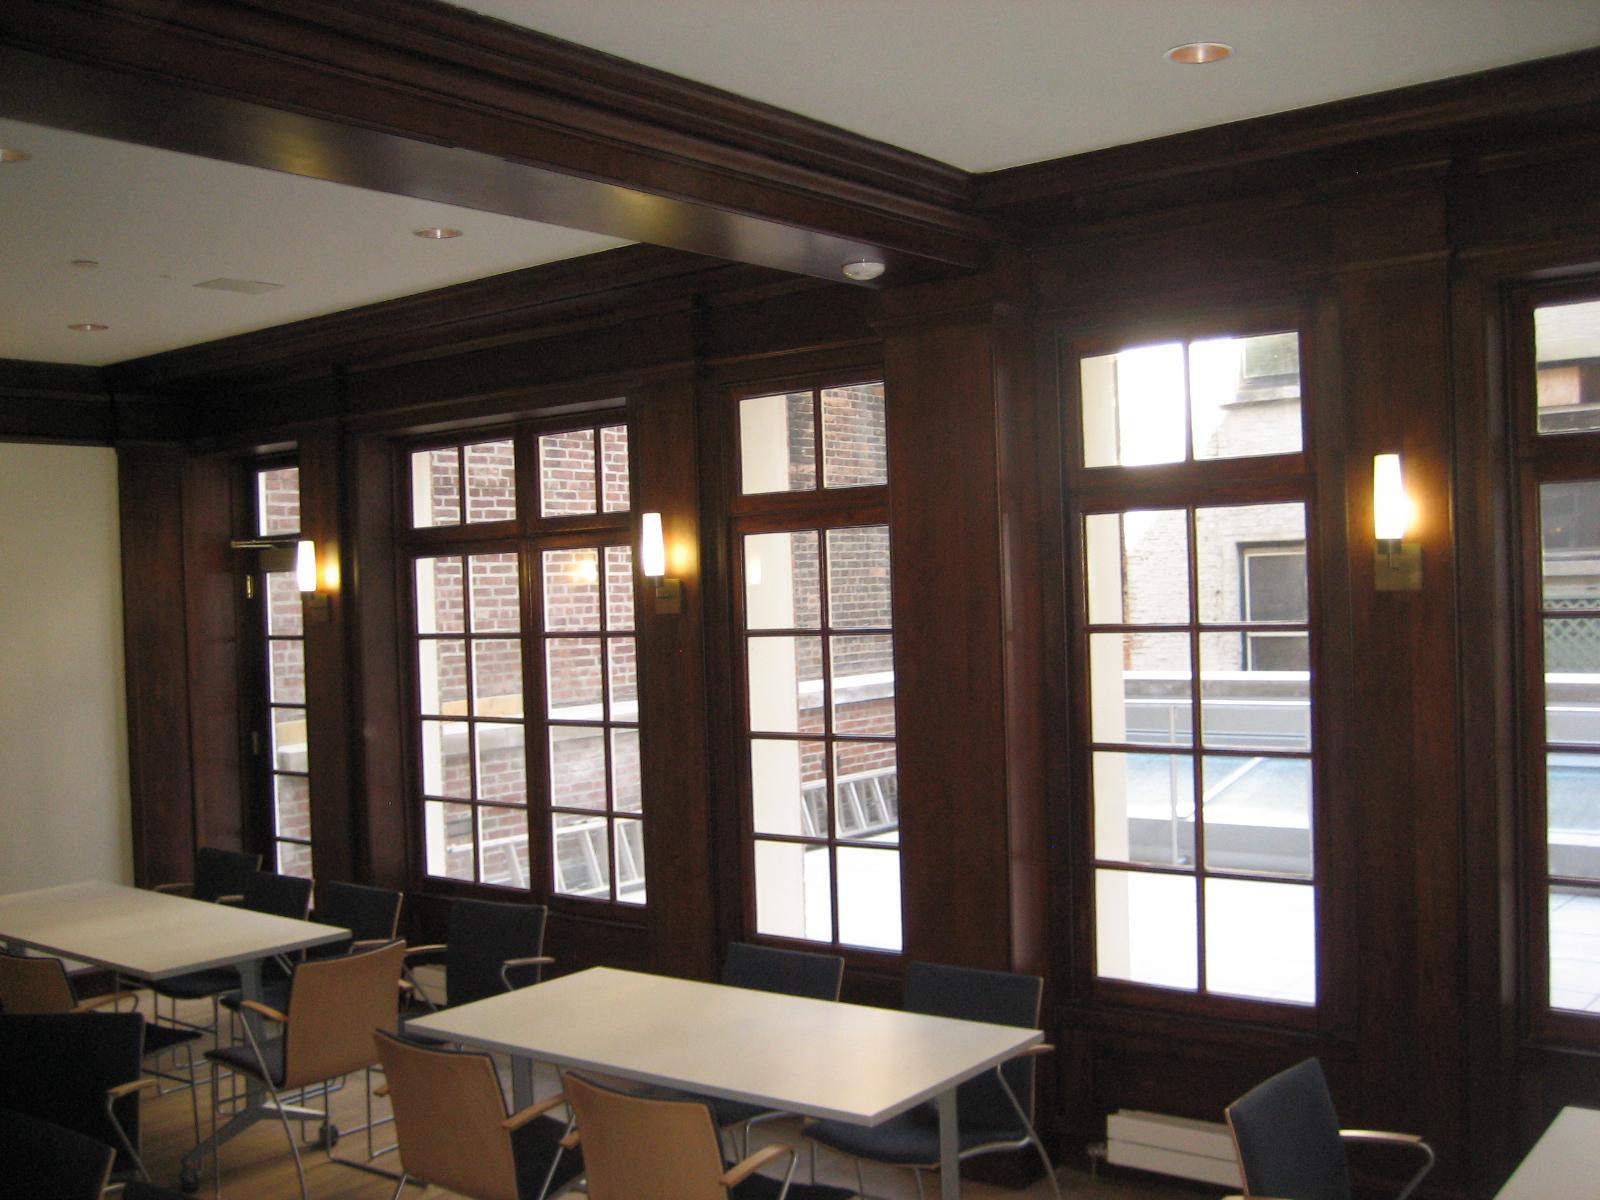 Walnut Library Study Room